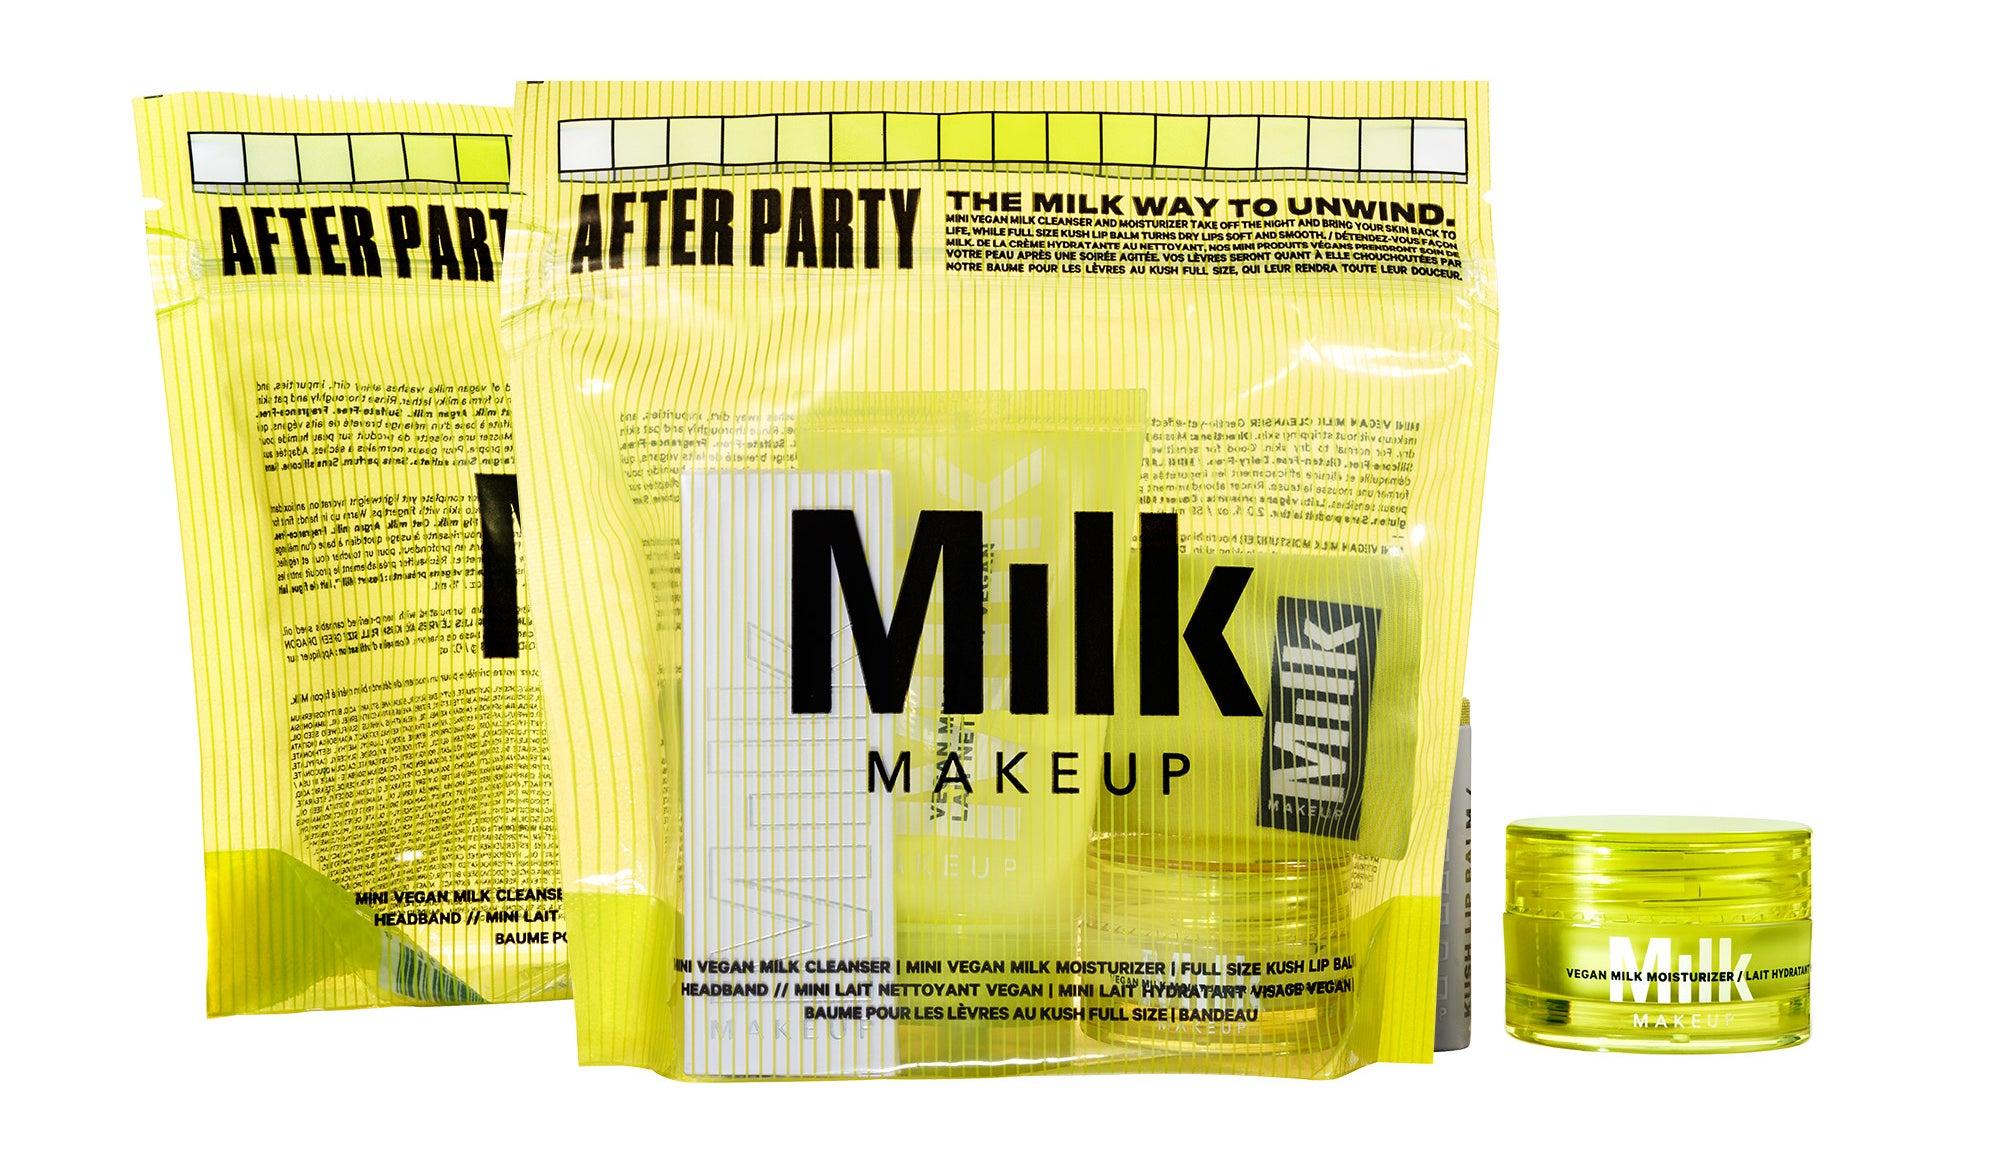 The milk makeup after party skincare set